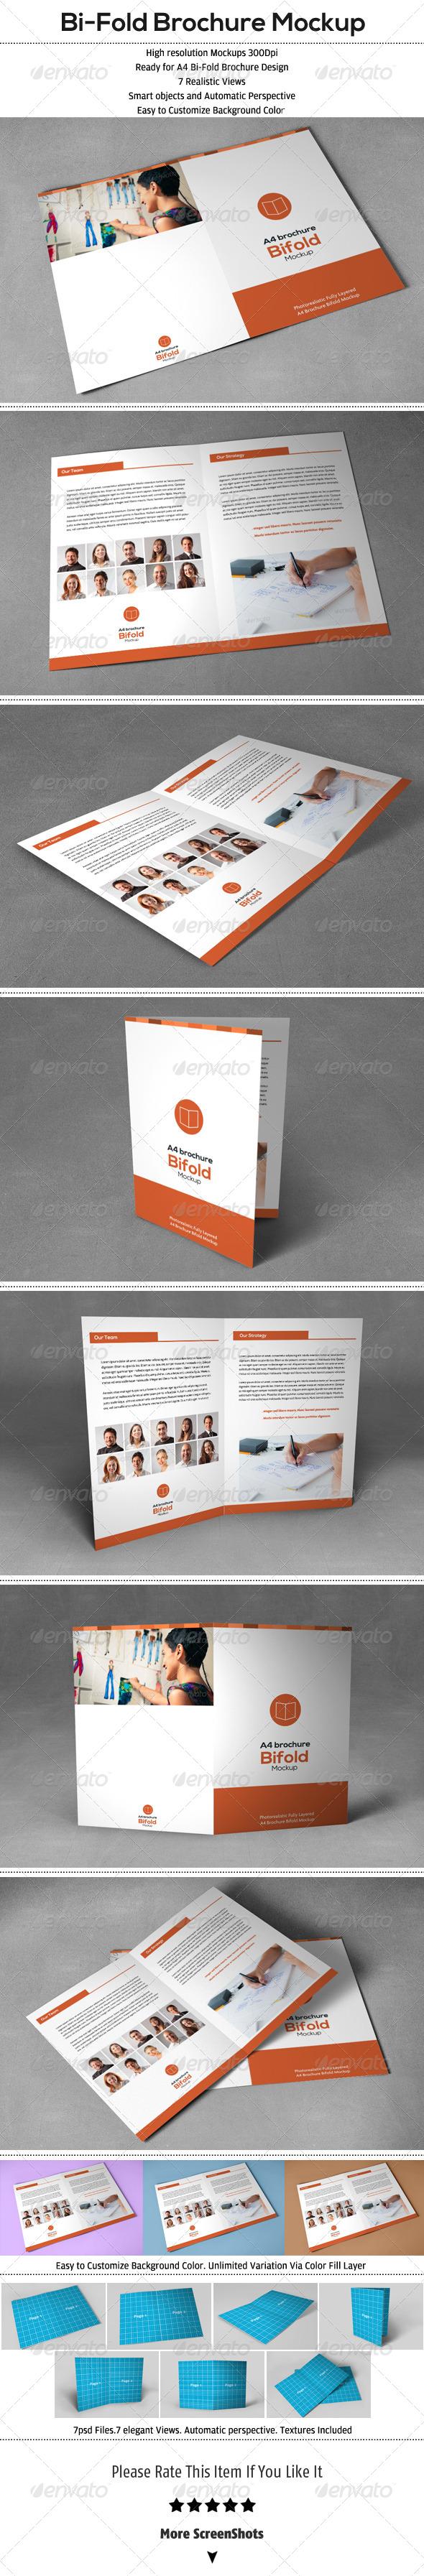 Bi-Fold Brochure Mock-Up - Brochures Print